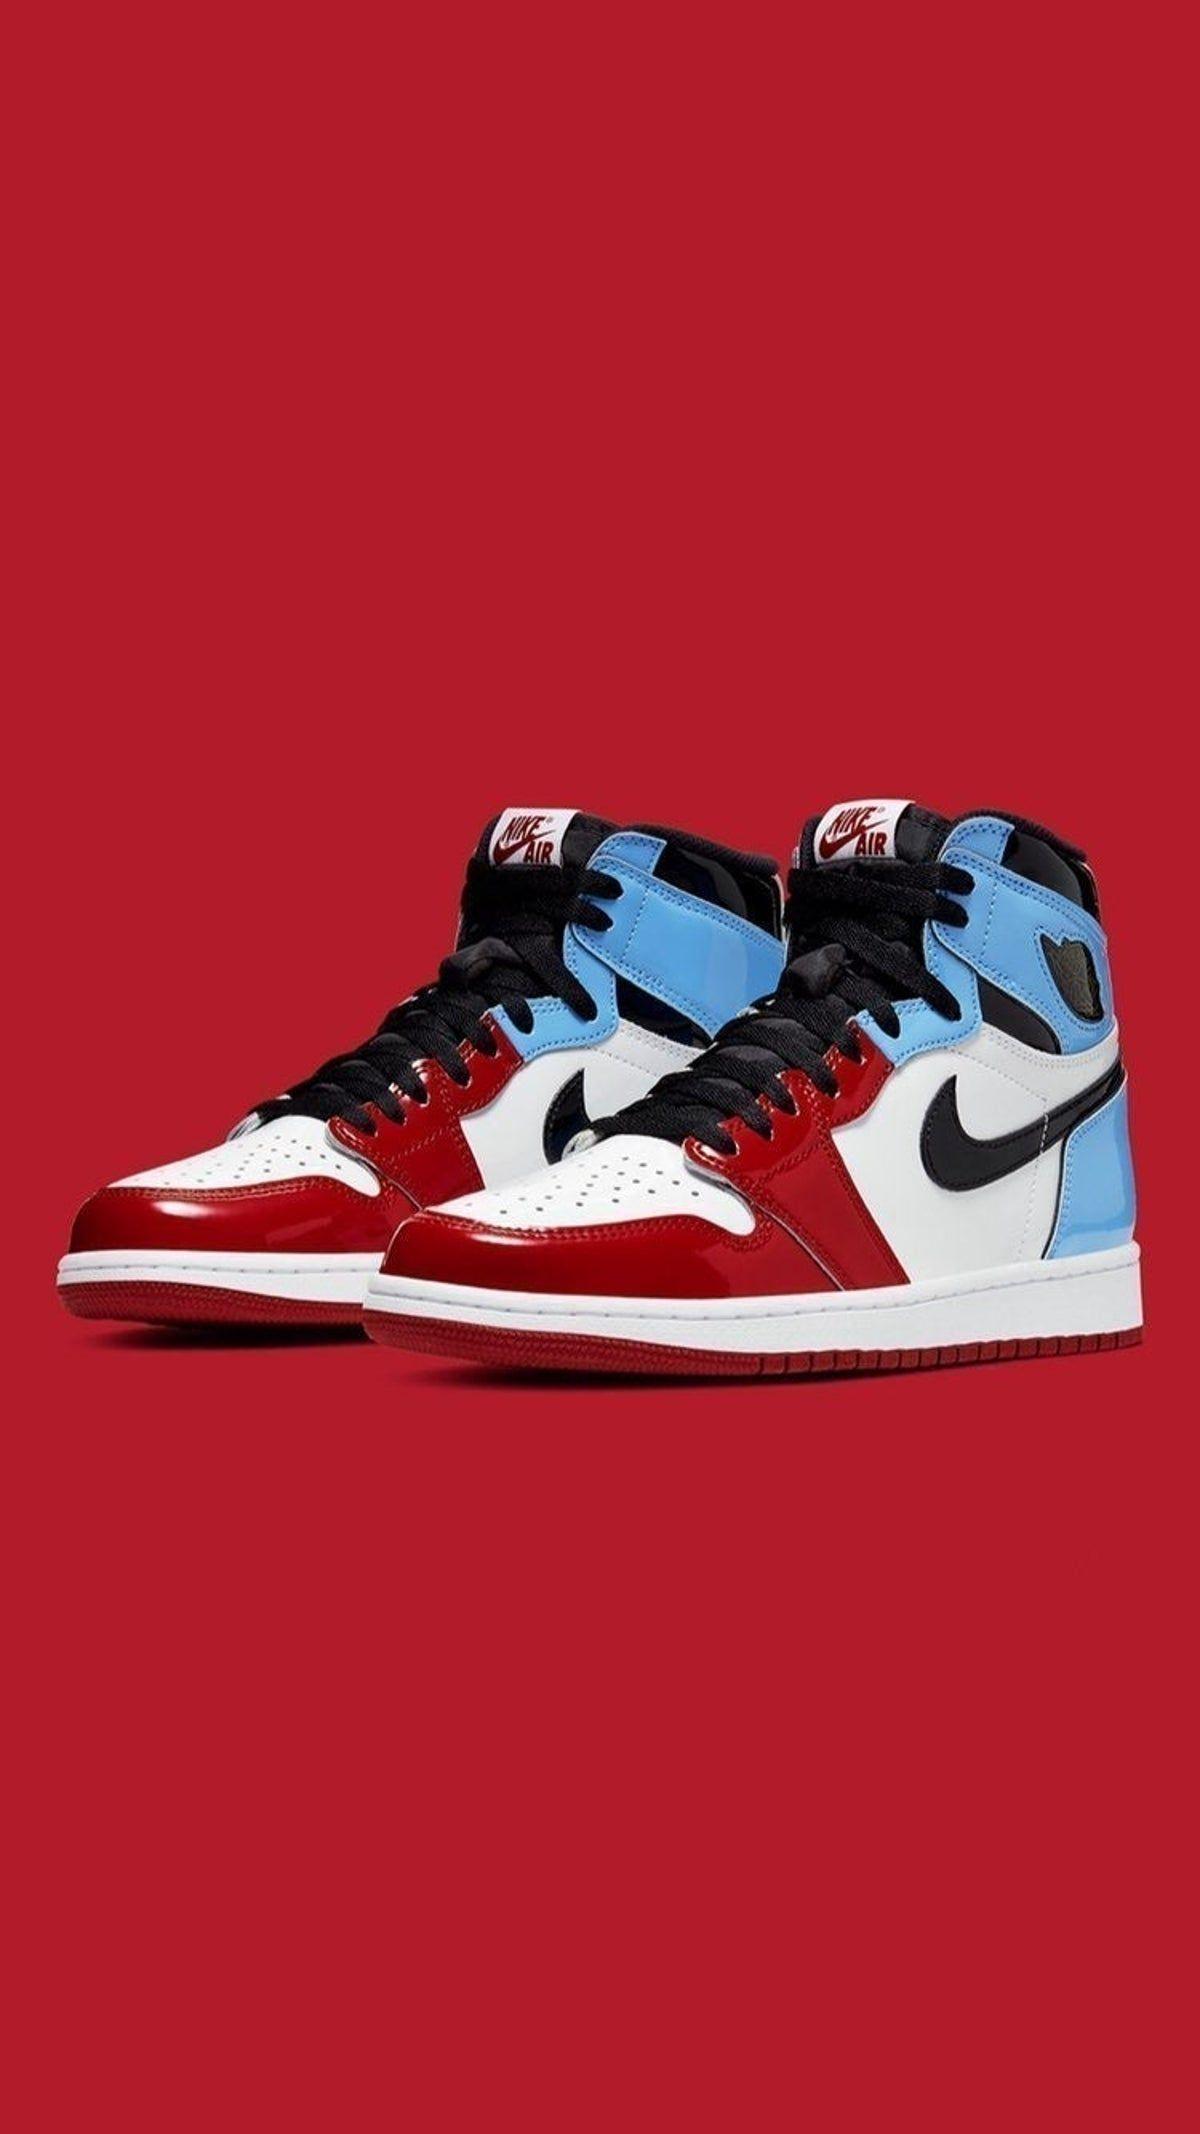 Air Jordan 1 High Fearless Unc Chicago Jordan Shoes Wallpaper Jordan Shoes Retro Shoes Wallpaper